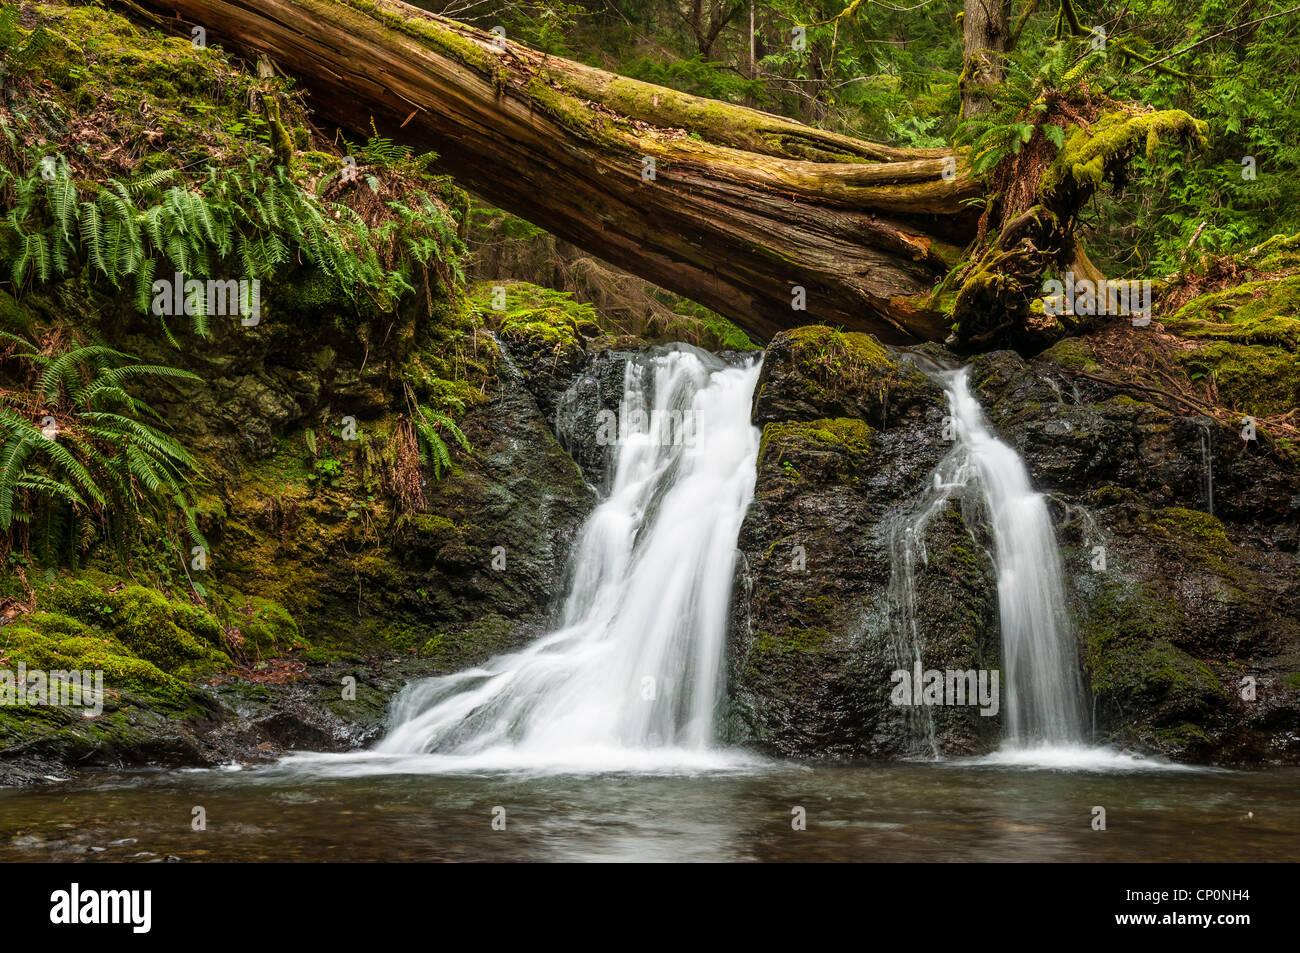 Rustic Falls, Moran State Park, Orcas Island; San Juan Islands, Washington. - Stock Image